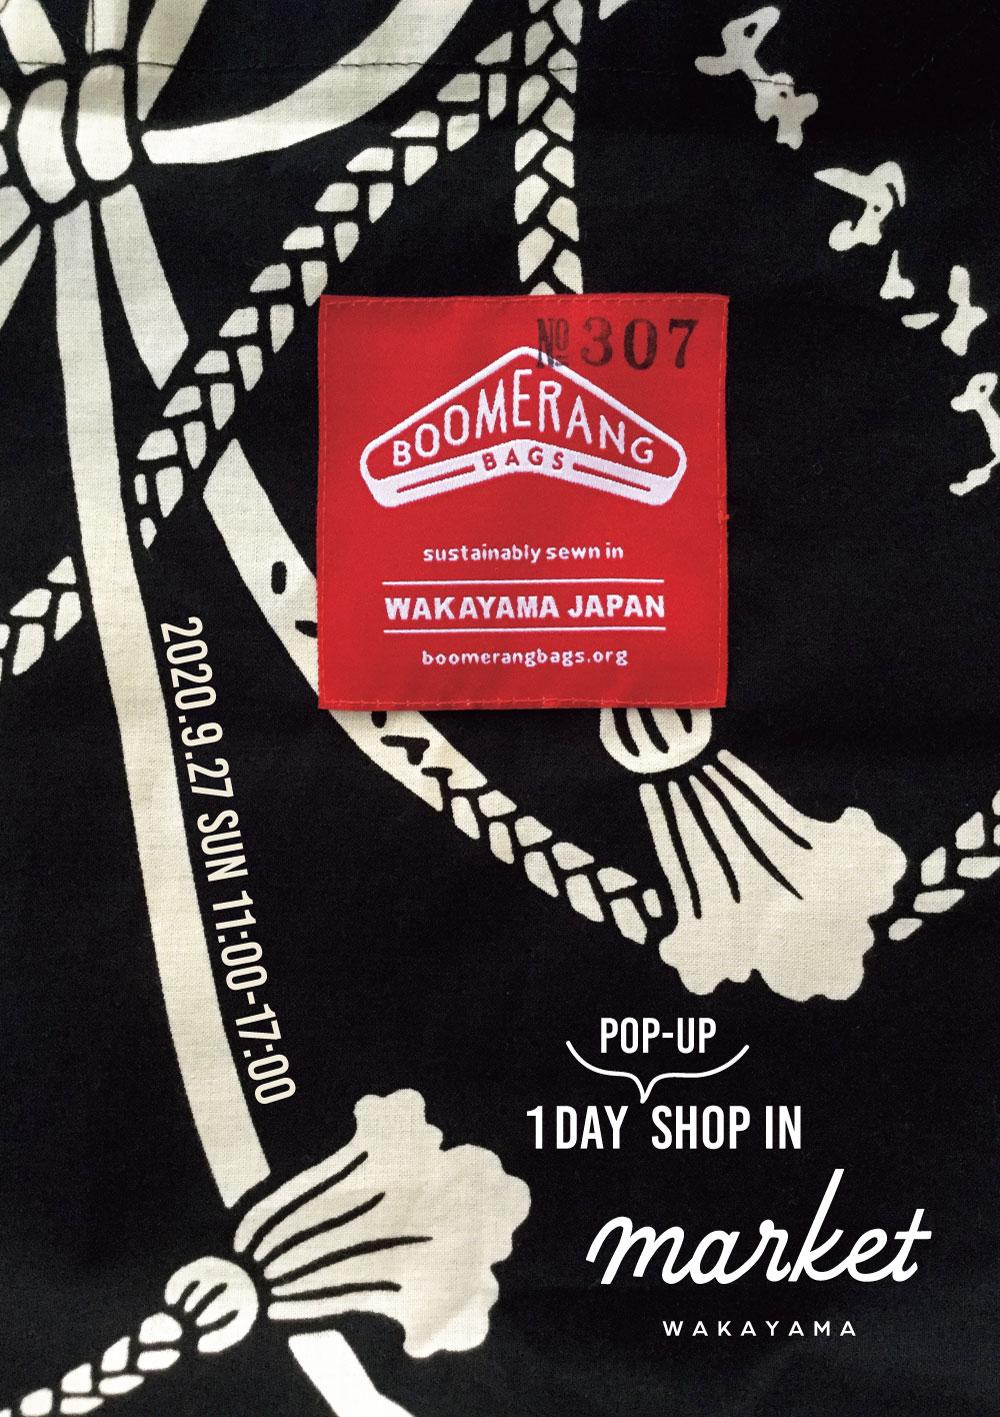 Boomerang Bags 1 DAY POP-UP SHOP@market WAKAYAMA